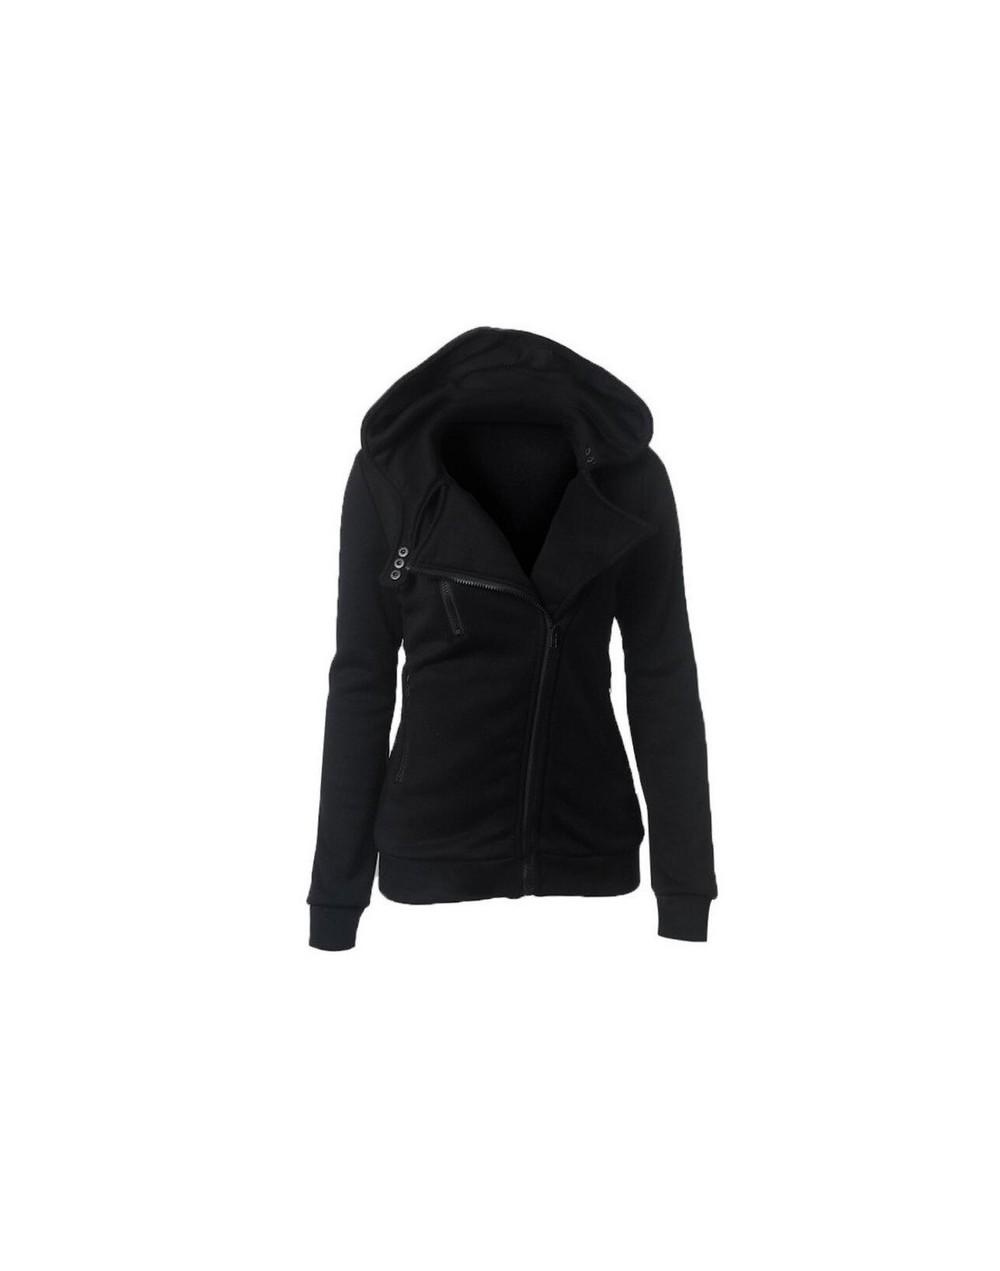 2019 Winter Jacket Women Hoodies Casual Solid Long Sleeve Zipper Thicken Mujer Sweatshirts Sudaderas Trancksuits Coat Outwea...